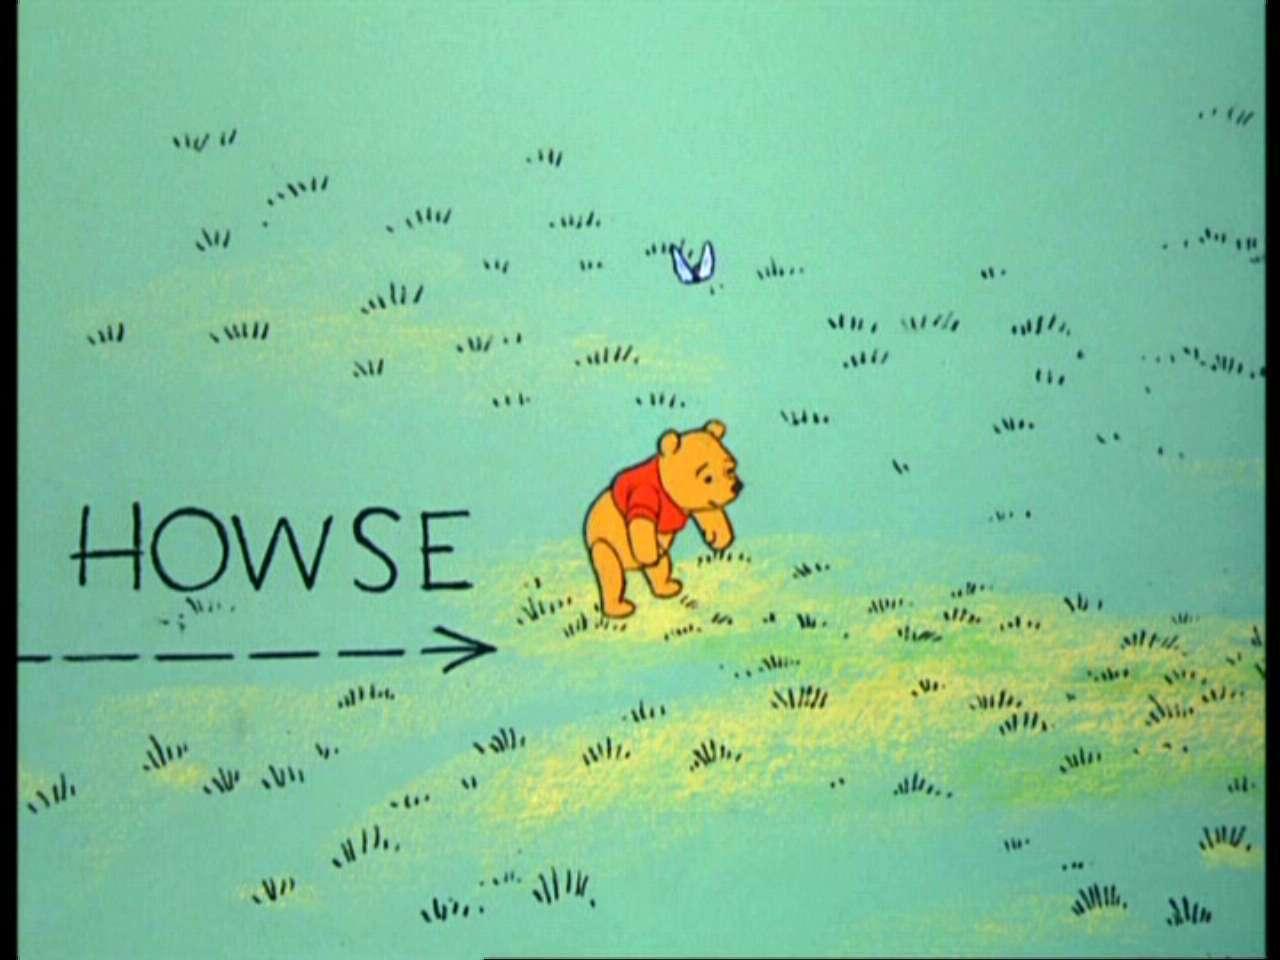 Winnie-the-Pooh-and-the-Hunny-Tree-winnie-the-pooh-2034751-1280-960 ...